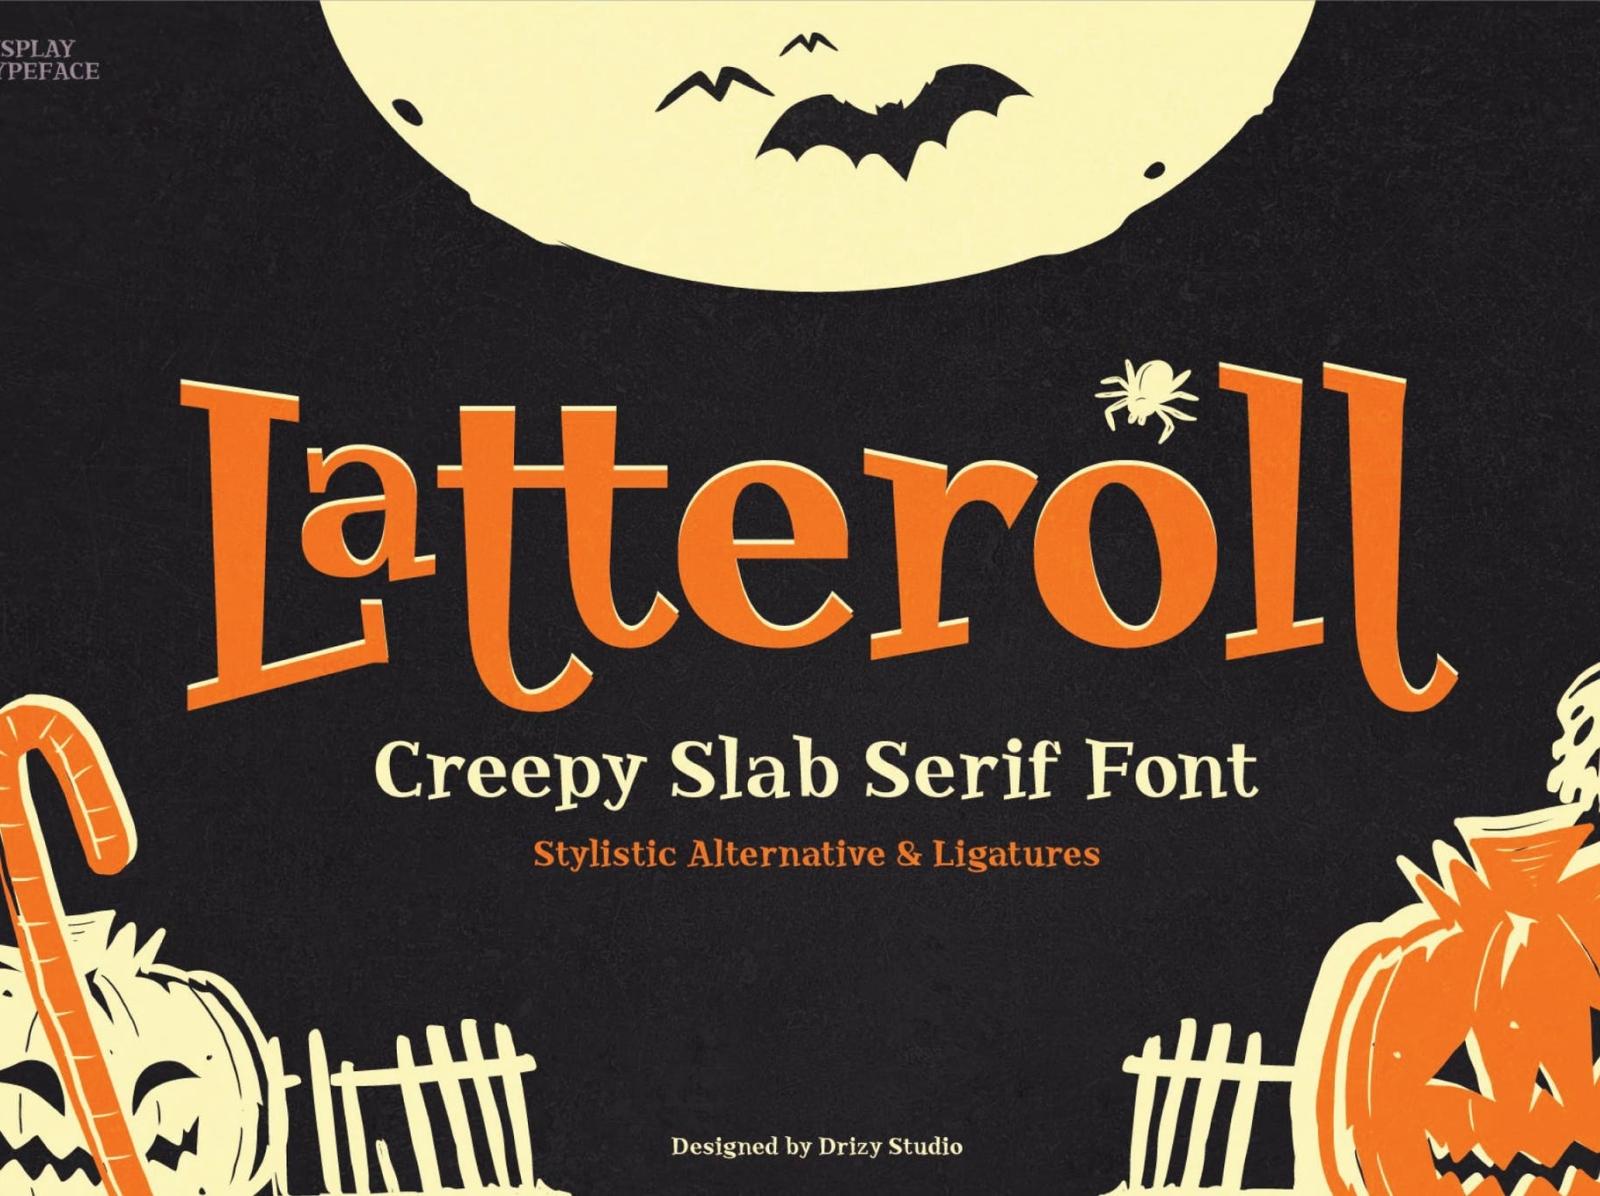 Letteroll Halloween Font display font pumpkin display haunted spooky halloween font ux vector ui app logo typography illustration graphic design design branding